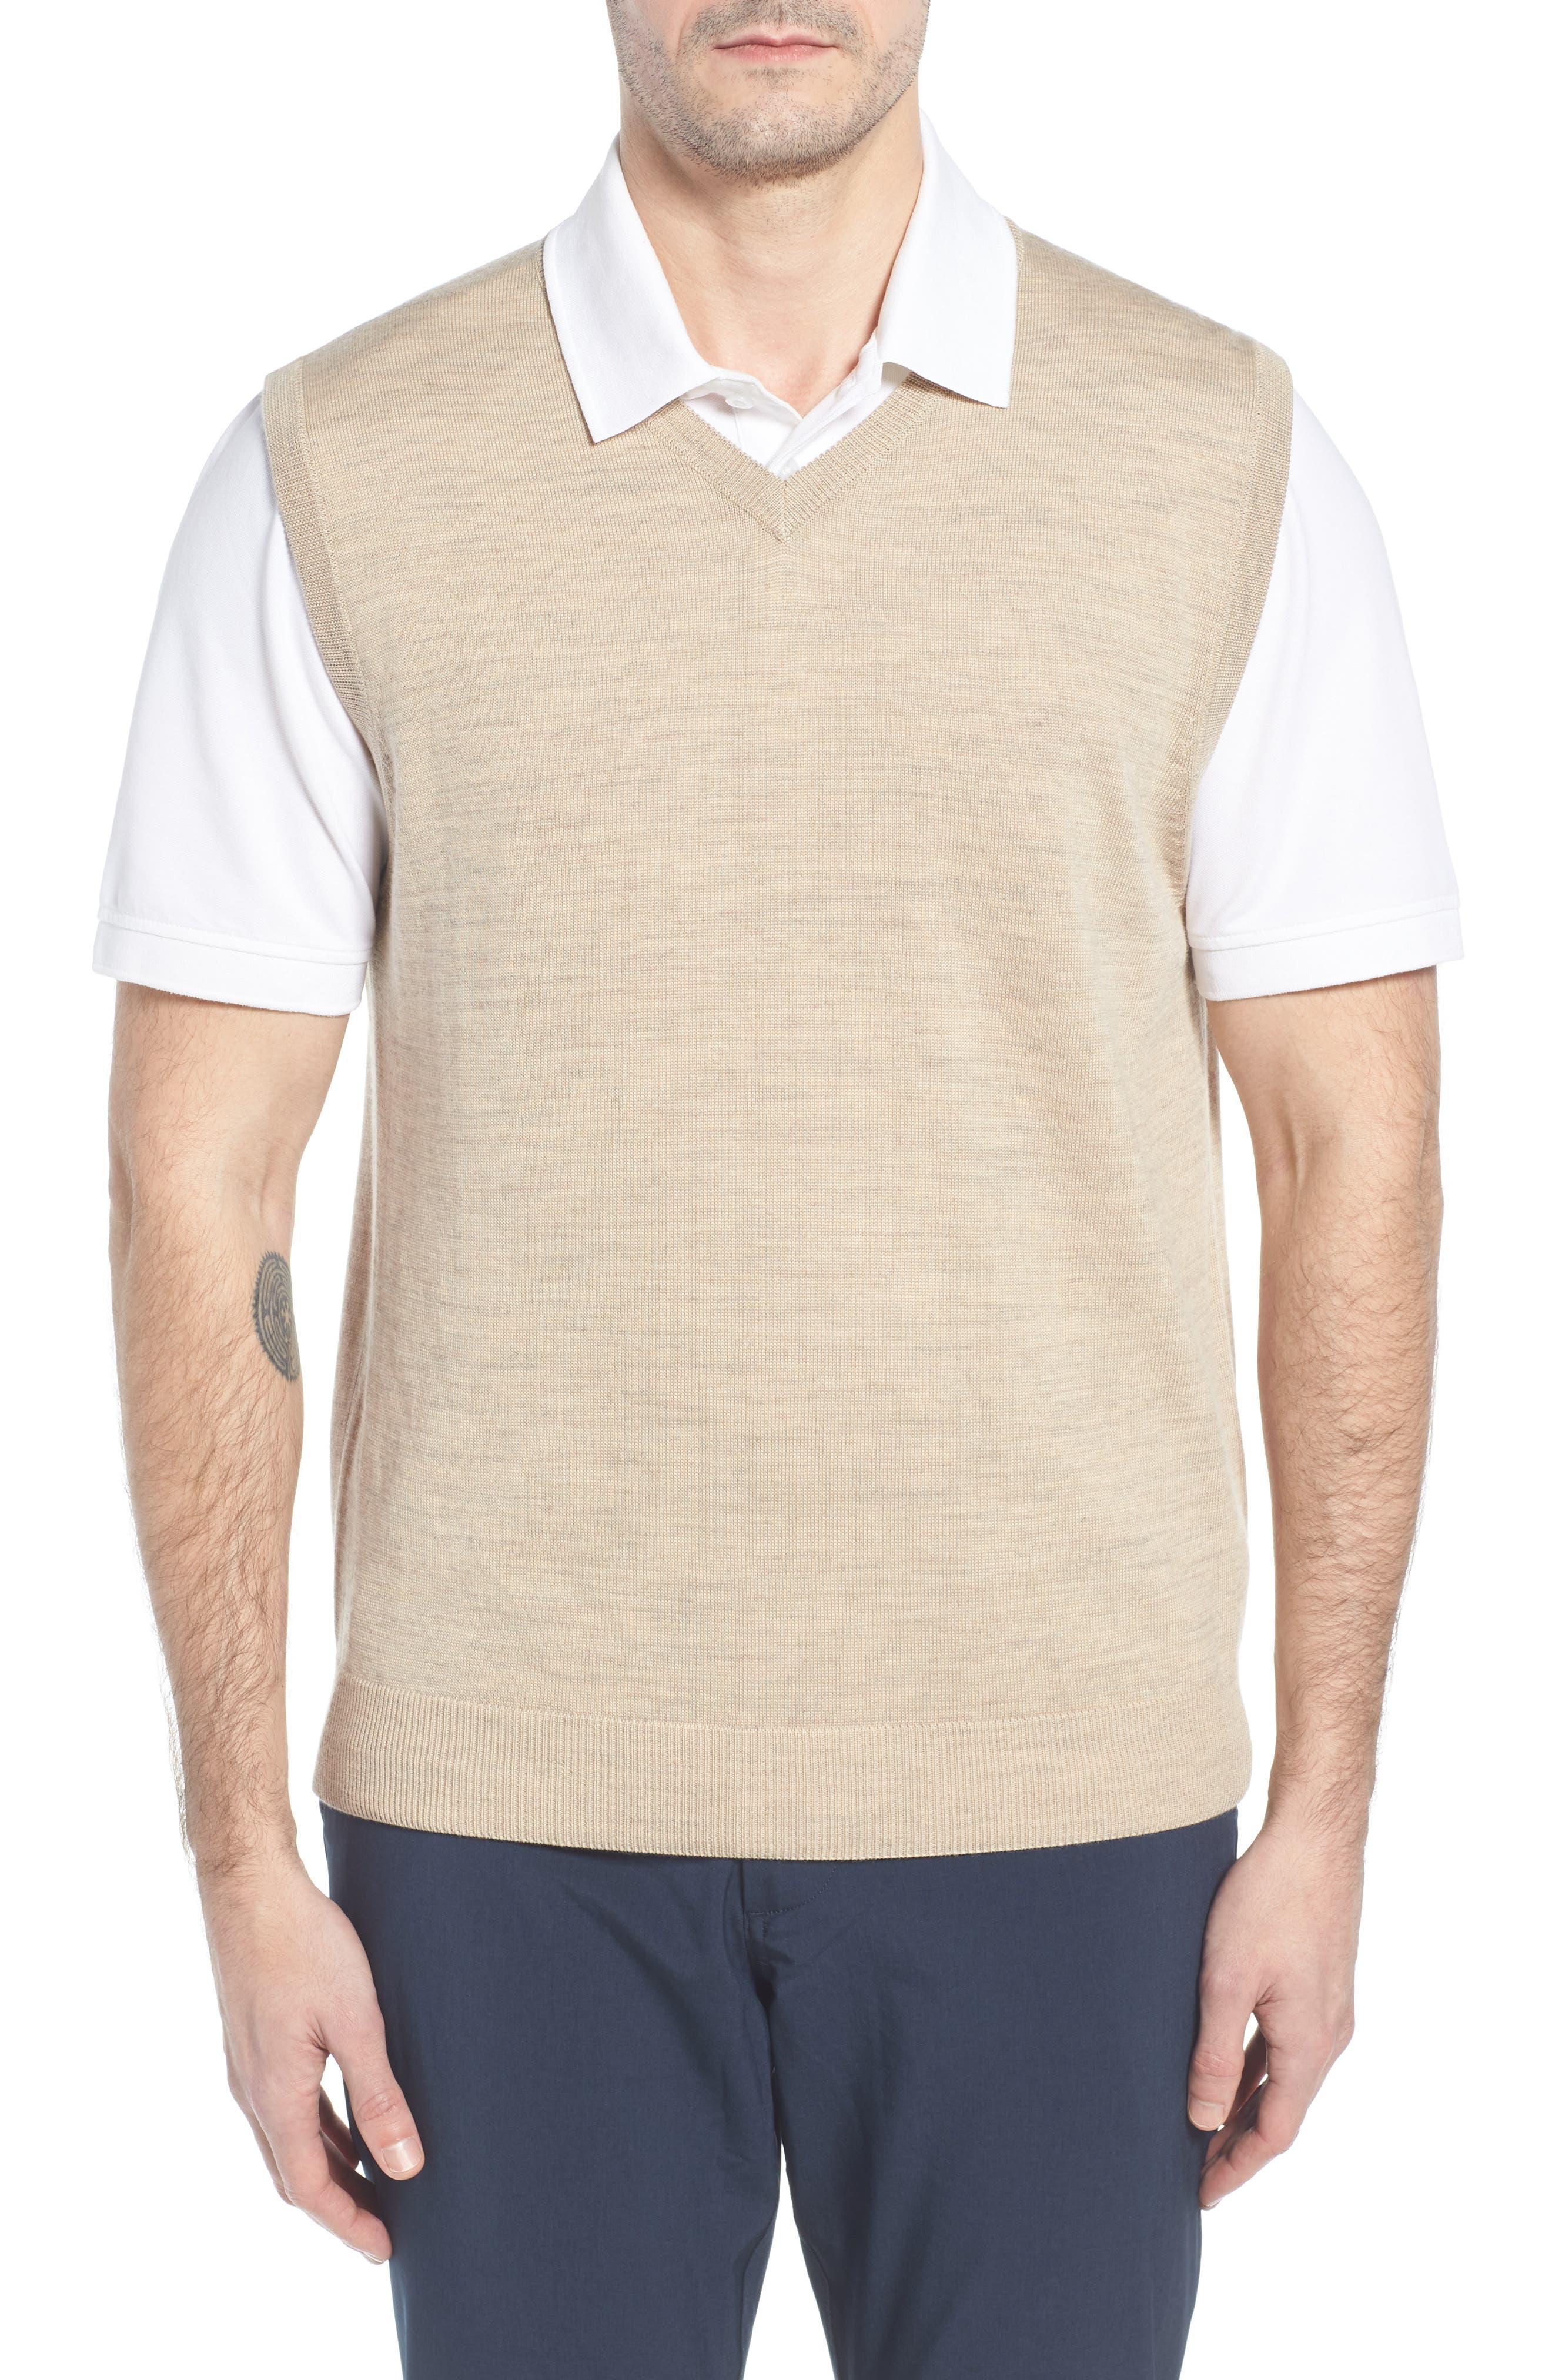 CUTTER & BUCK, 'Douglas' Merino Wool Blend V-Neck Sweater Vest, Main thumbnail 1, color, SAND HEATHER